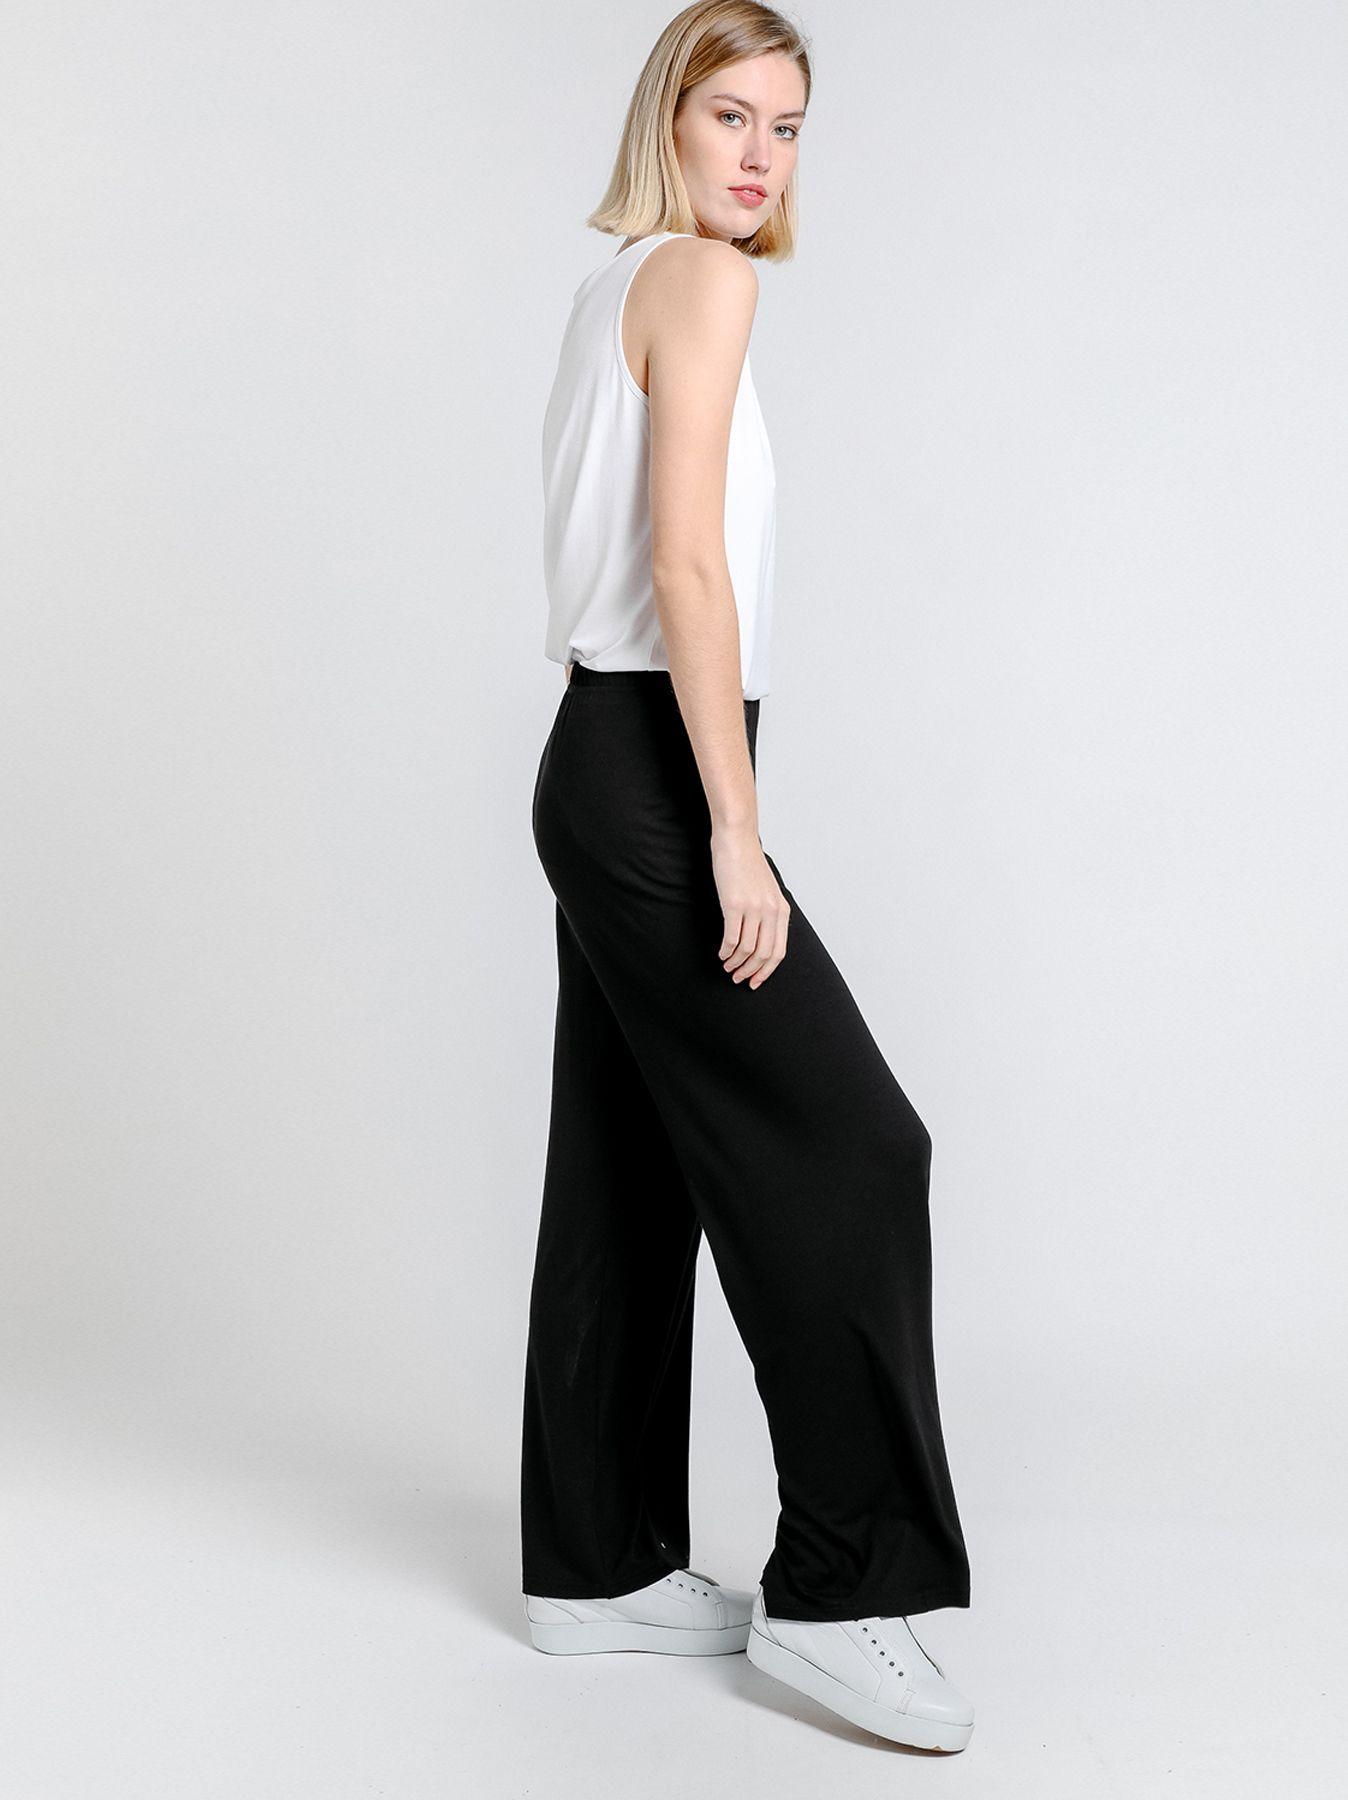 Pantalone elastico in tinta unita